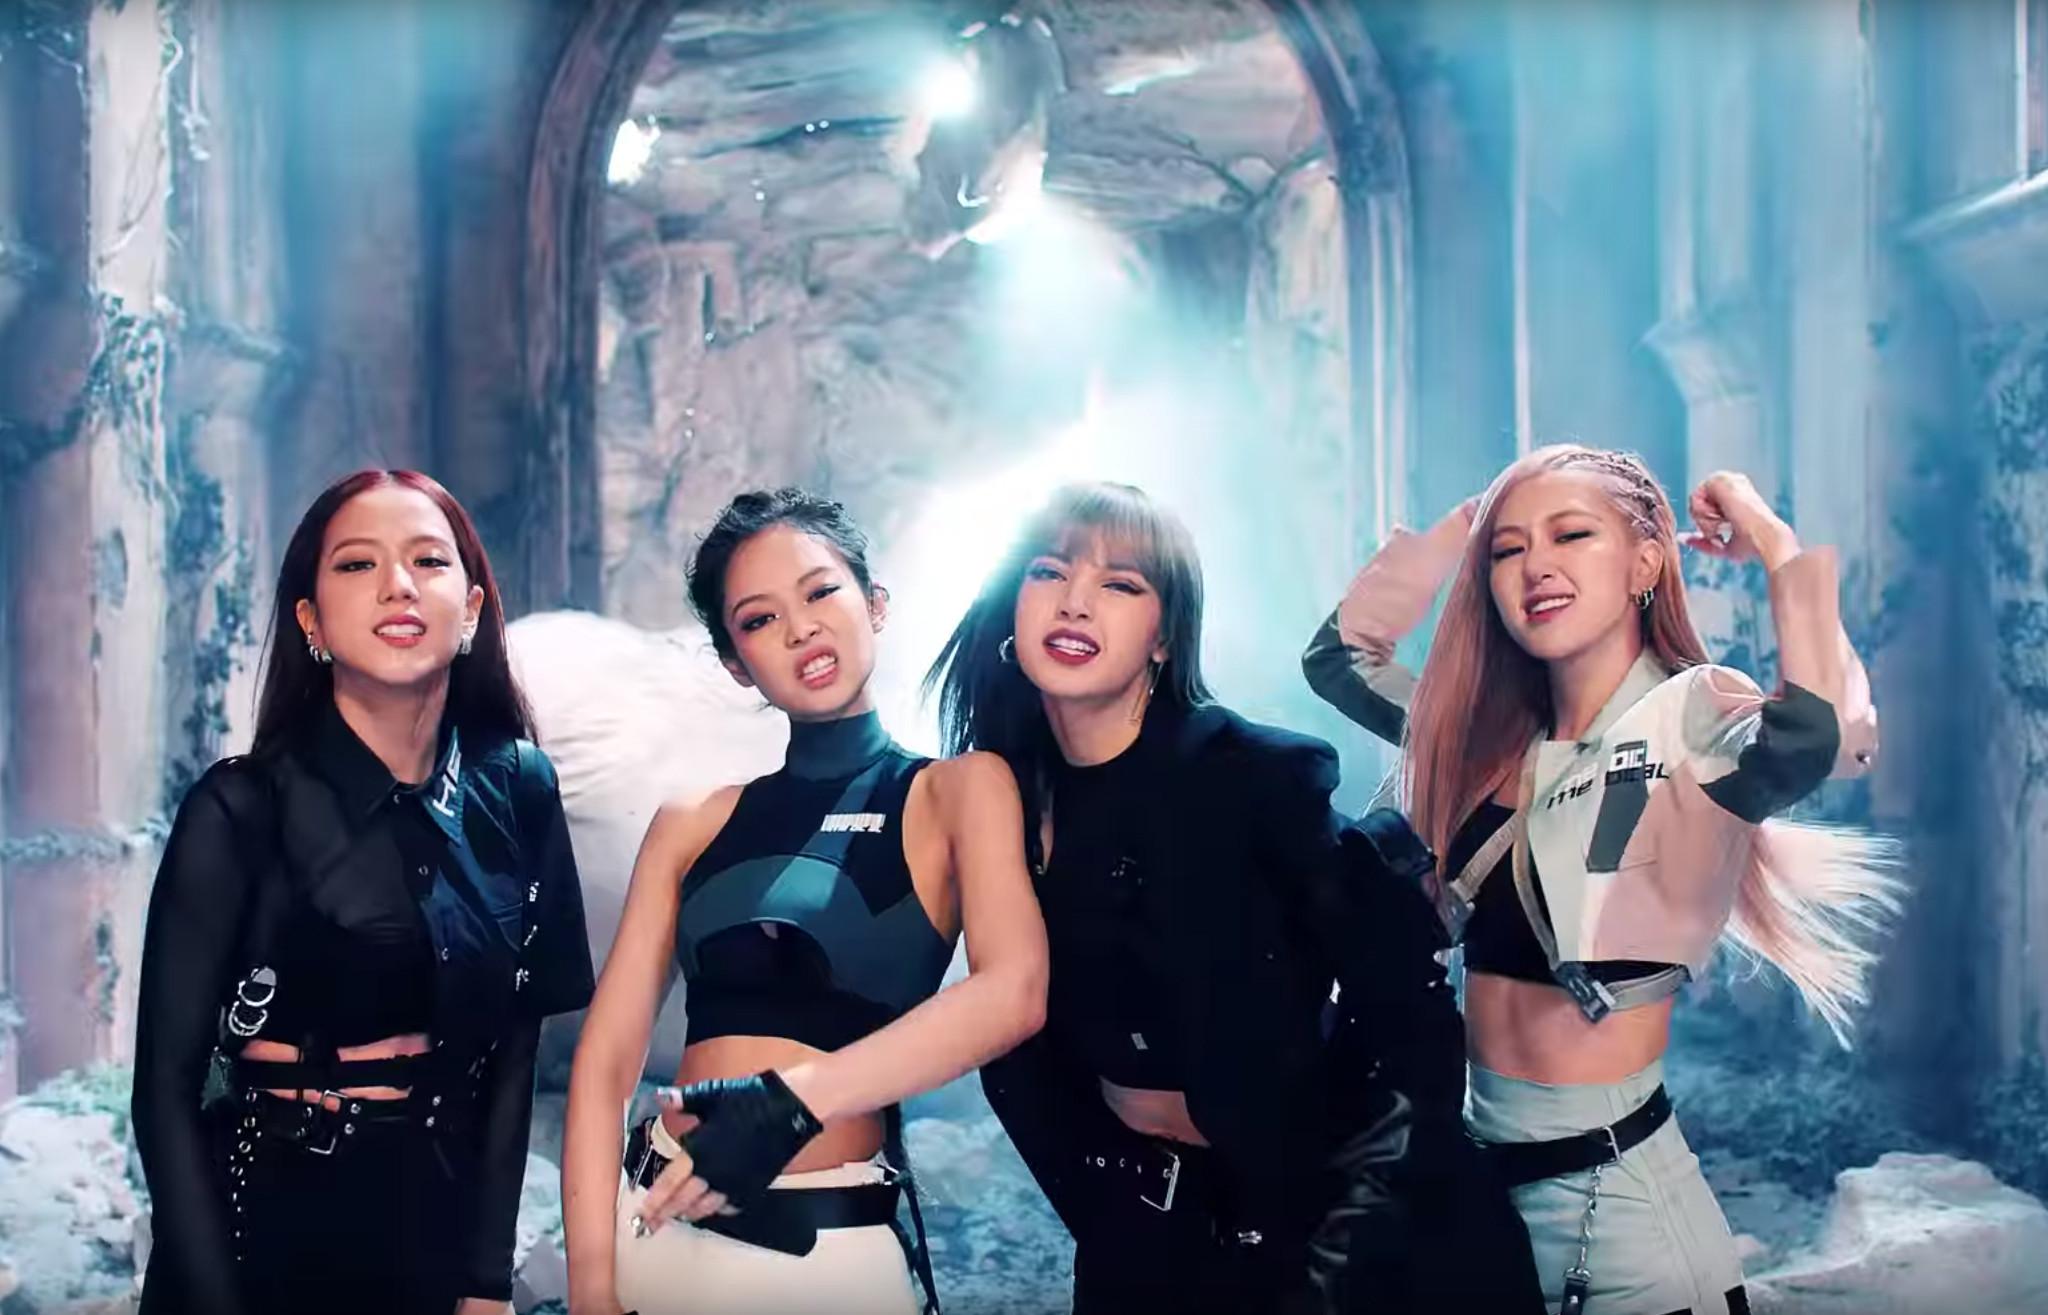 KBS Bans Airing BLACKPINK's 'Kill This Love' MV | E! News